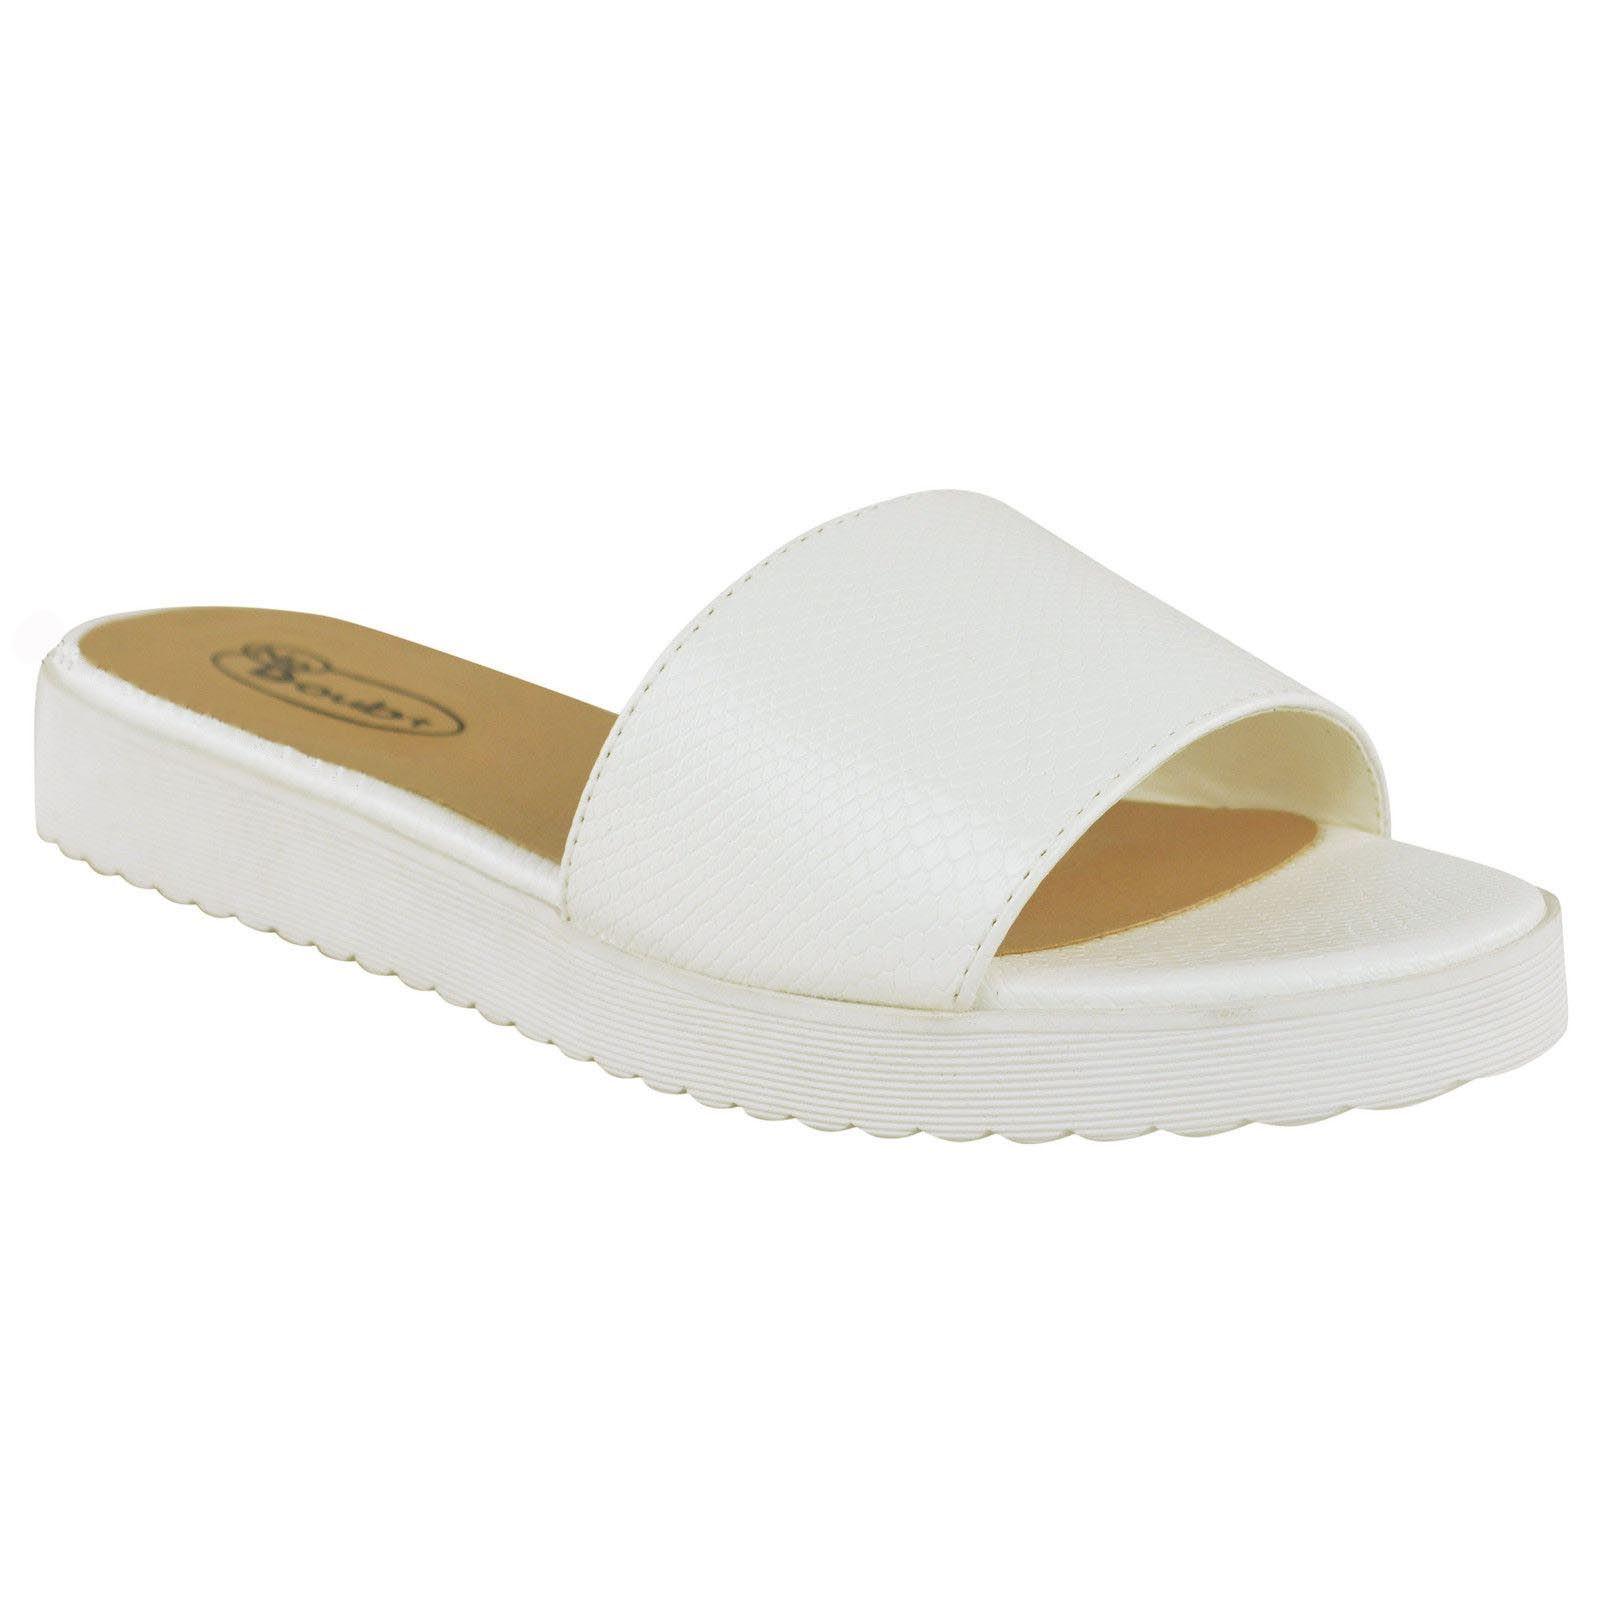 Womens Slip On Sandals Mules Summer Beach Flip Flops ...